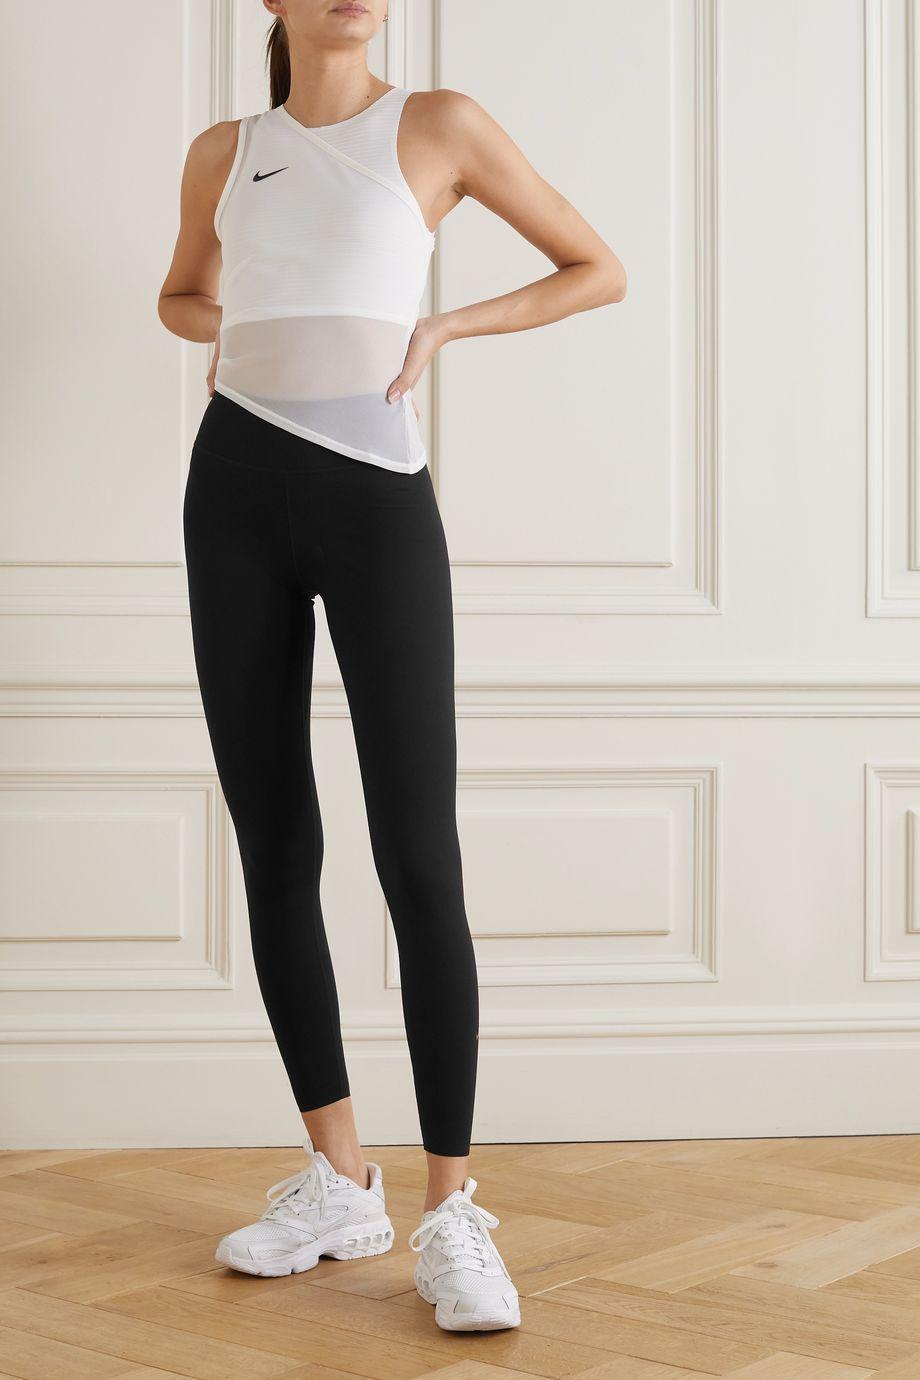 Nike One Luxe Dri-FIT stretch leggings